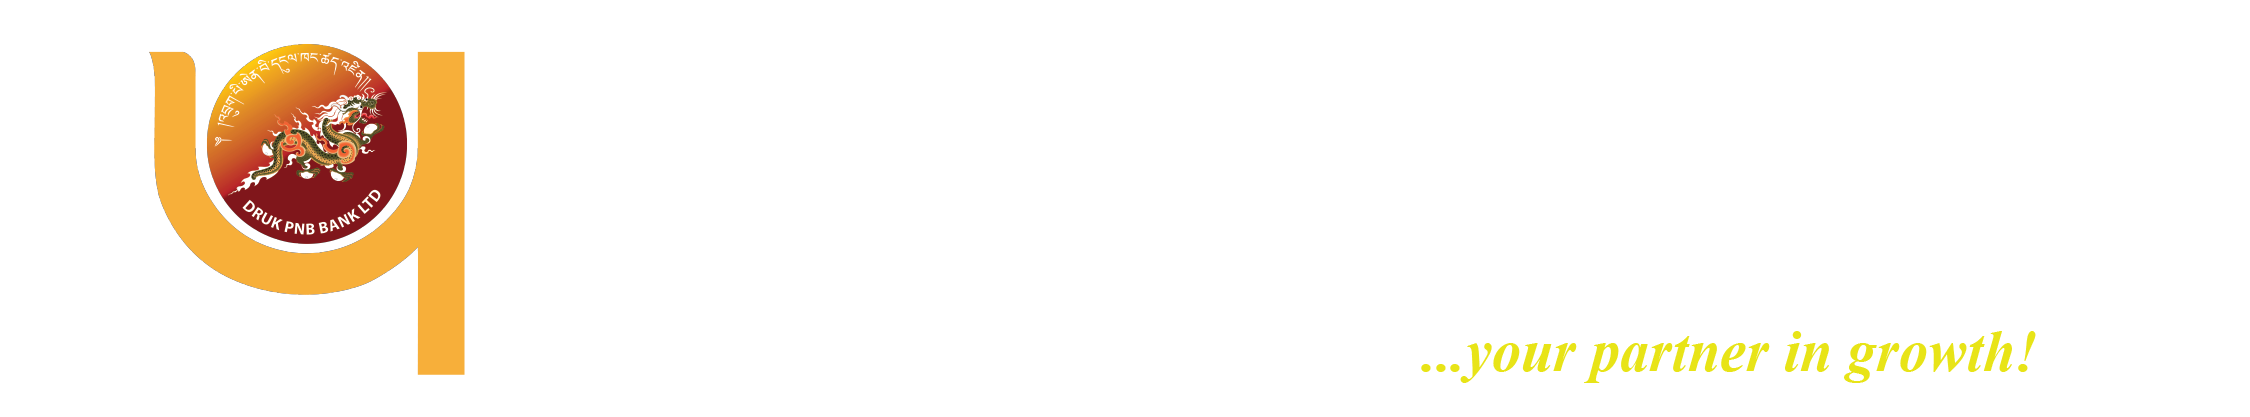 Druk PNB Bank Ltd.